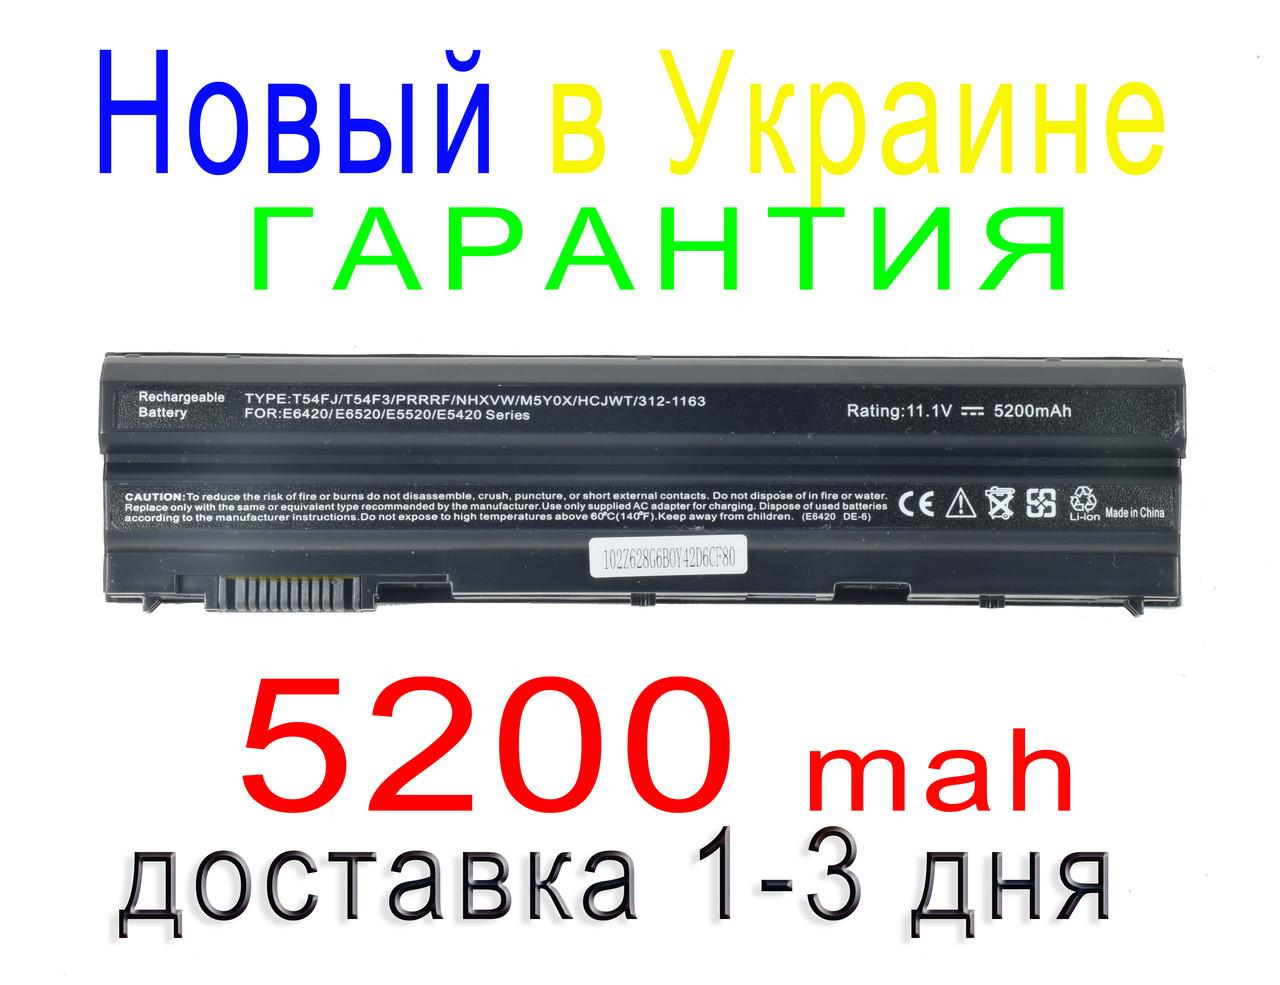 Аккумулятор батарея DELL Latitude  M2800 Vostro 3360 Vostro 3460 Vostro 3560720  4420  4520  4720  5420